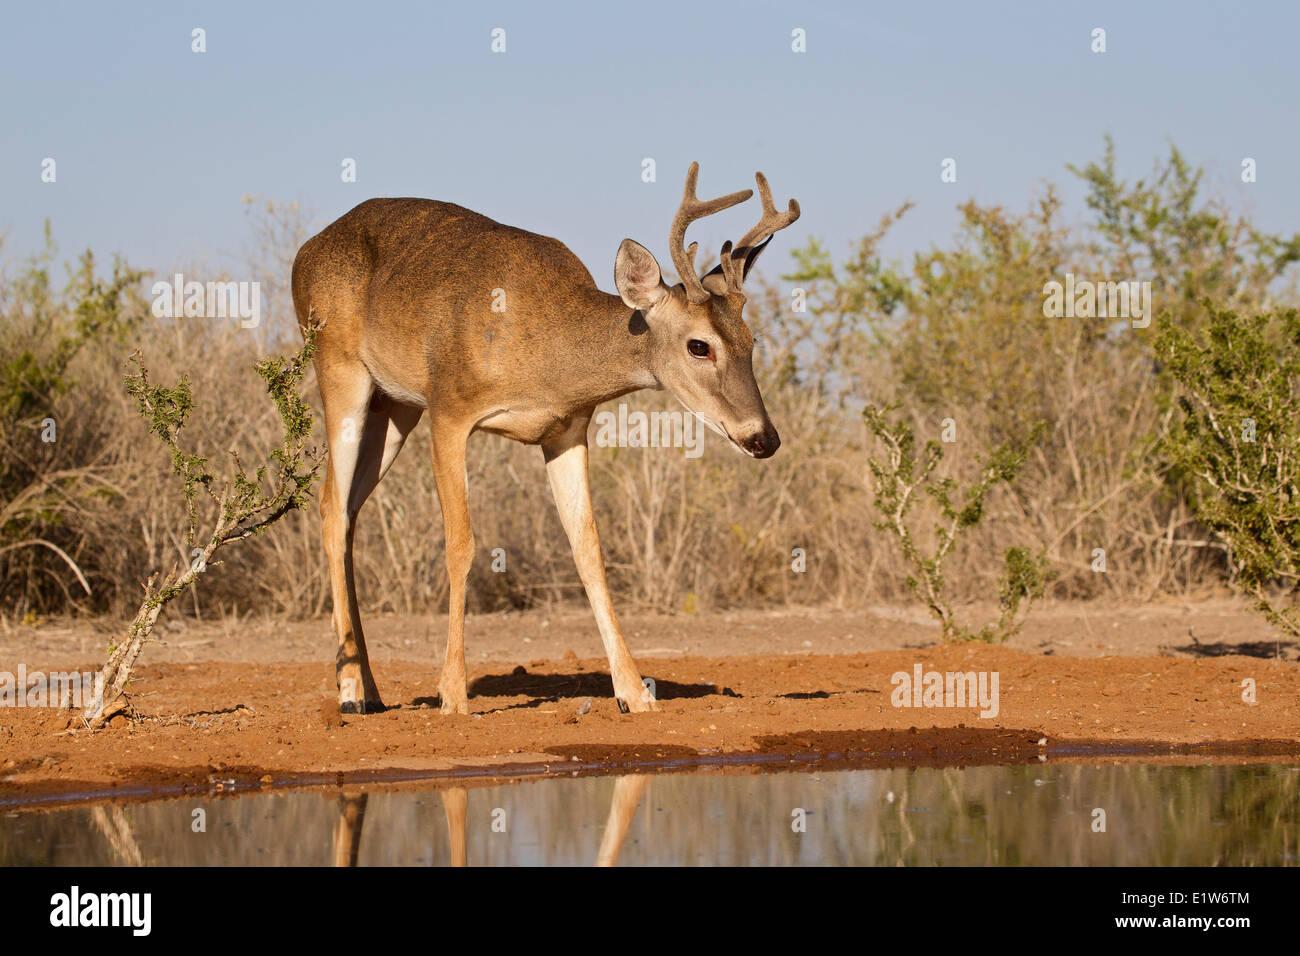 White-tailed deer (Odocoileus virginianus), buck, at pond to drink water, Santa Clara Ranch, near Edinburg, South - Stock Image